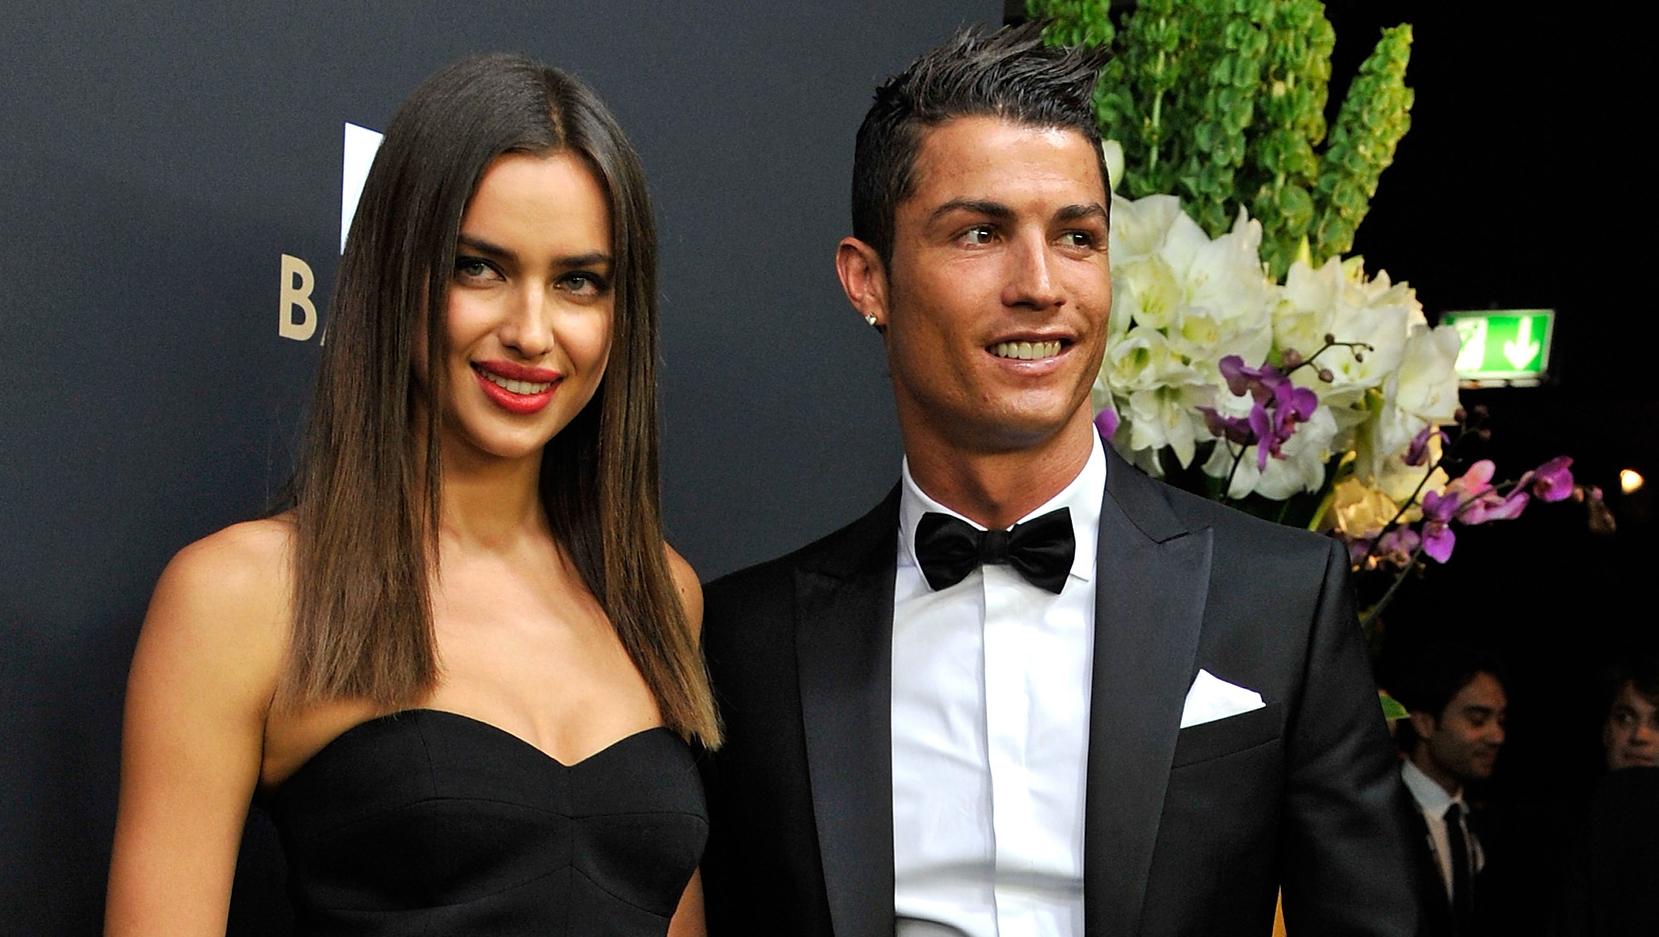 Cristiano Ronaldo and model Irina Shayk split after five years - CBS News